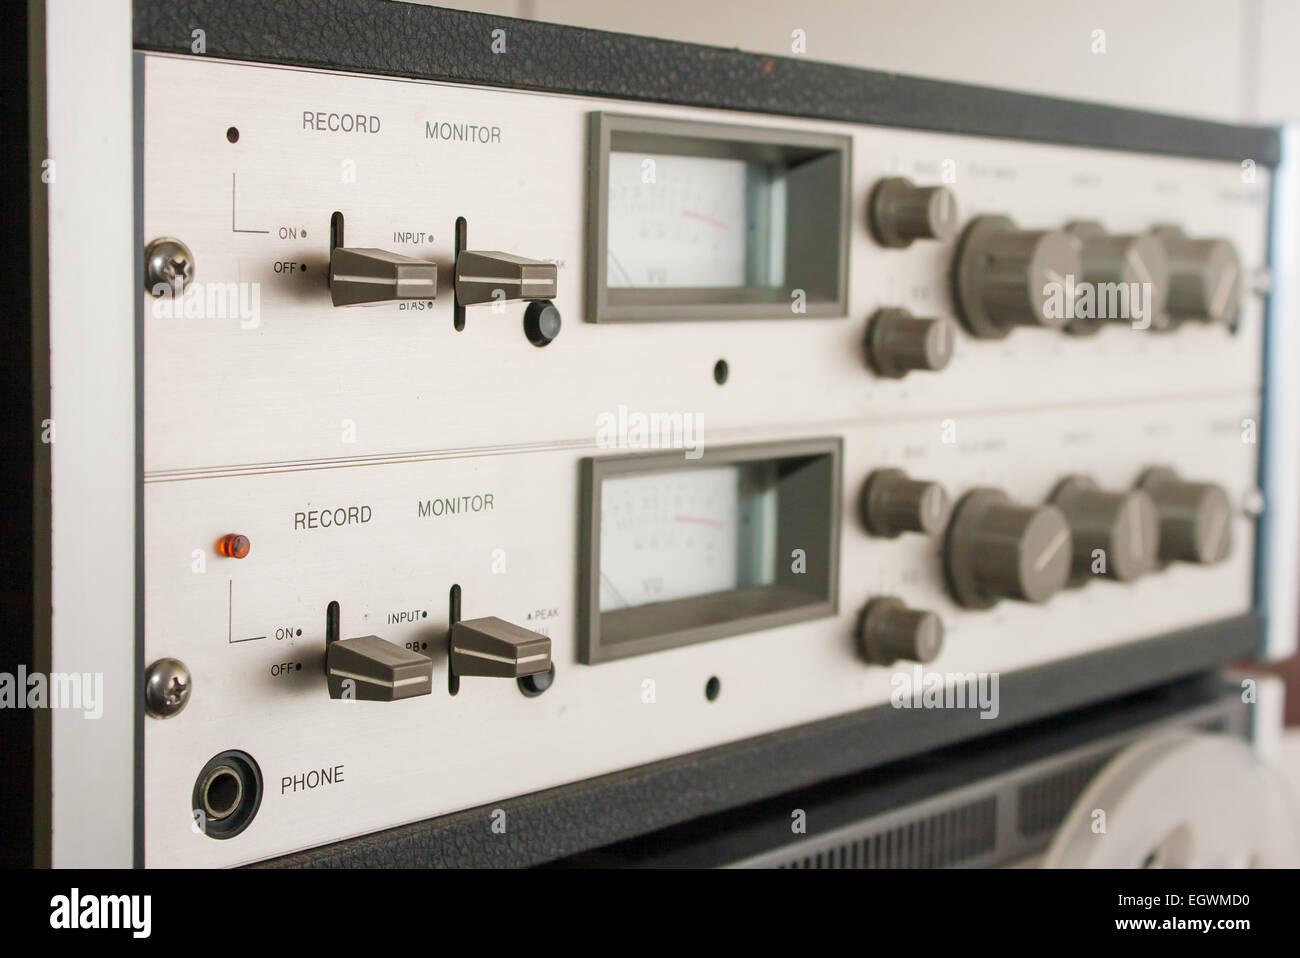 control panel reel tape recorder - Stock Image